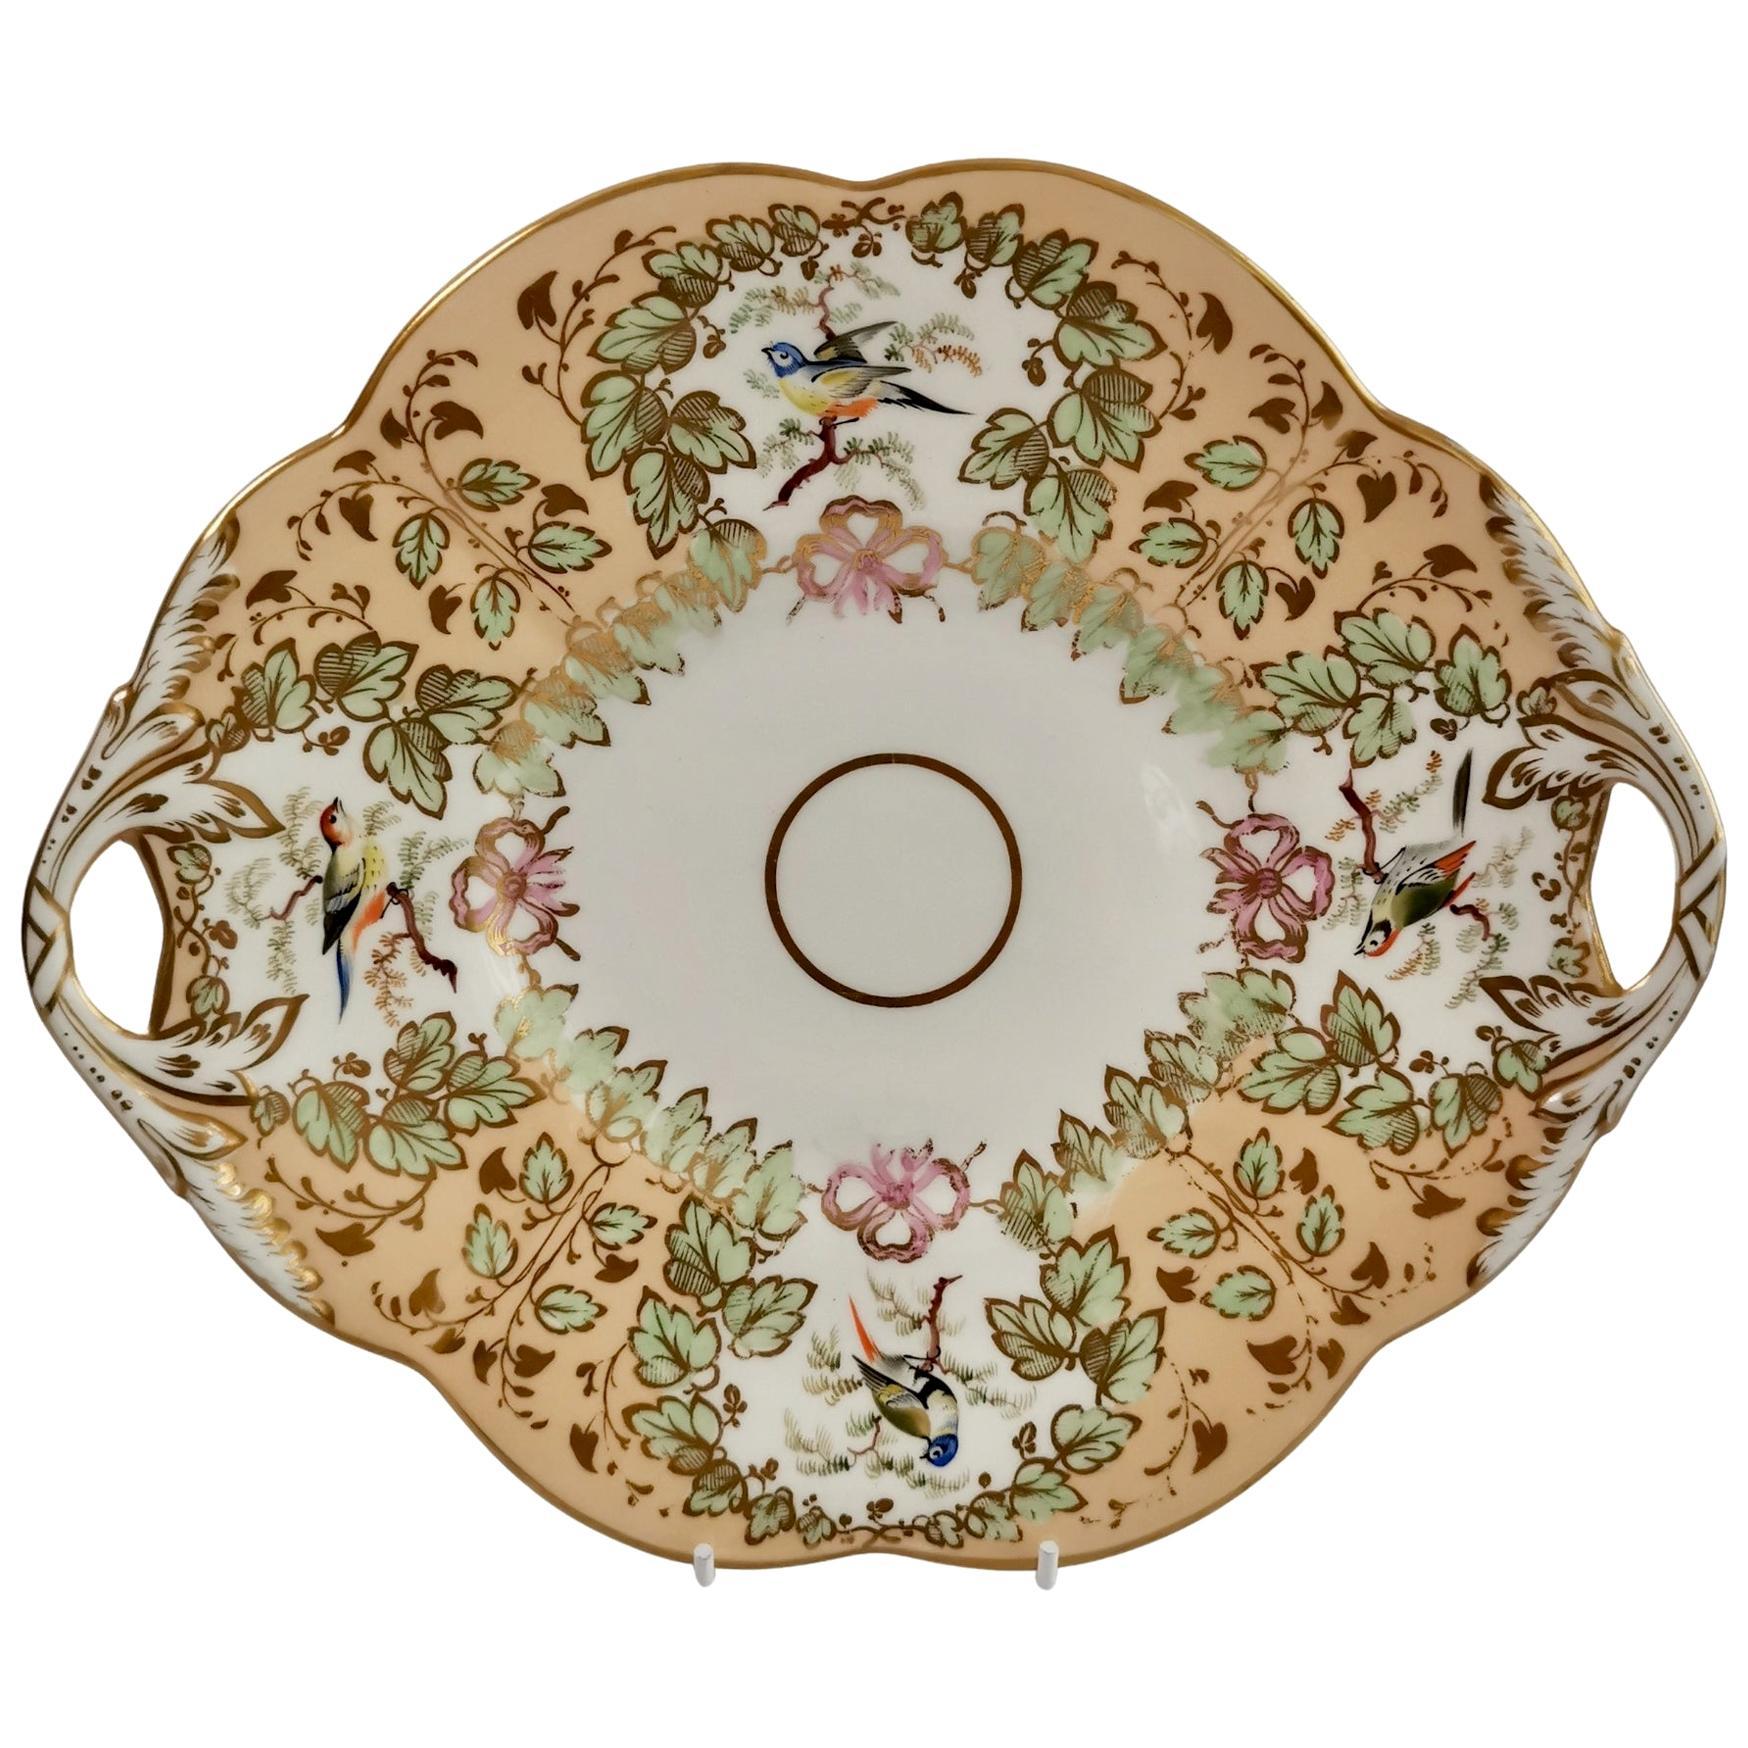 Samuel Alcock Porcelain Cake Plate, Peach Ground with Fine Birds, Victorian 1845